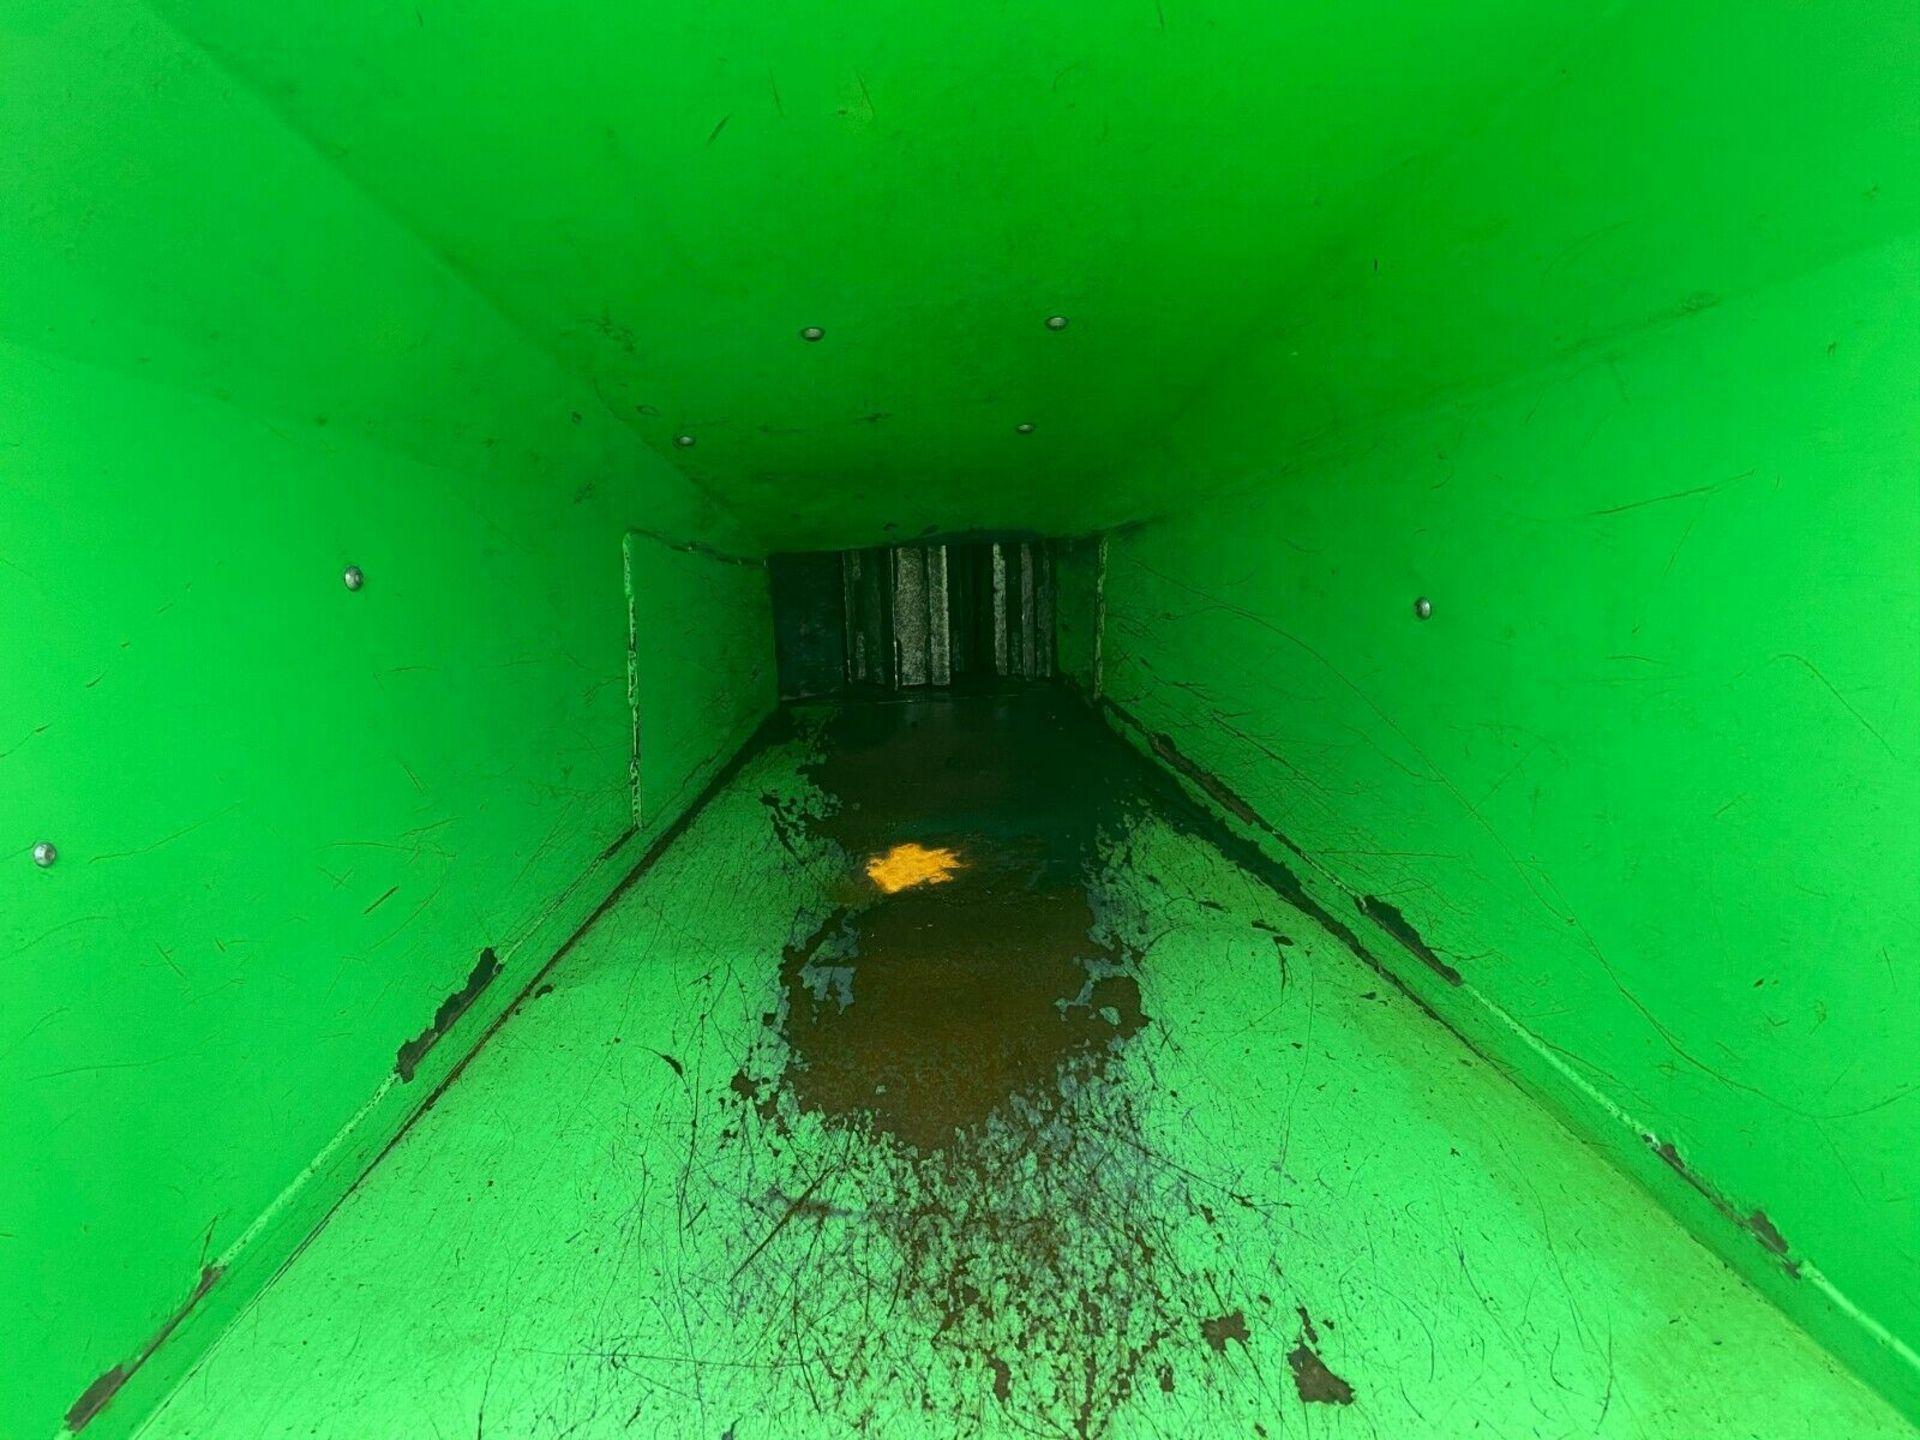 Lot 166 - GREENMECH ARBTRAK 150 TRACKED WOODCHIPPER, KUBOTA DIESEL ENGINE, ONLY 659 HOURS, YEAR 2014